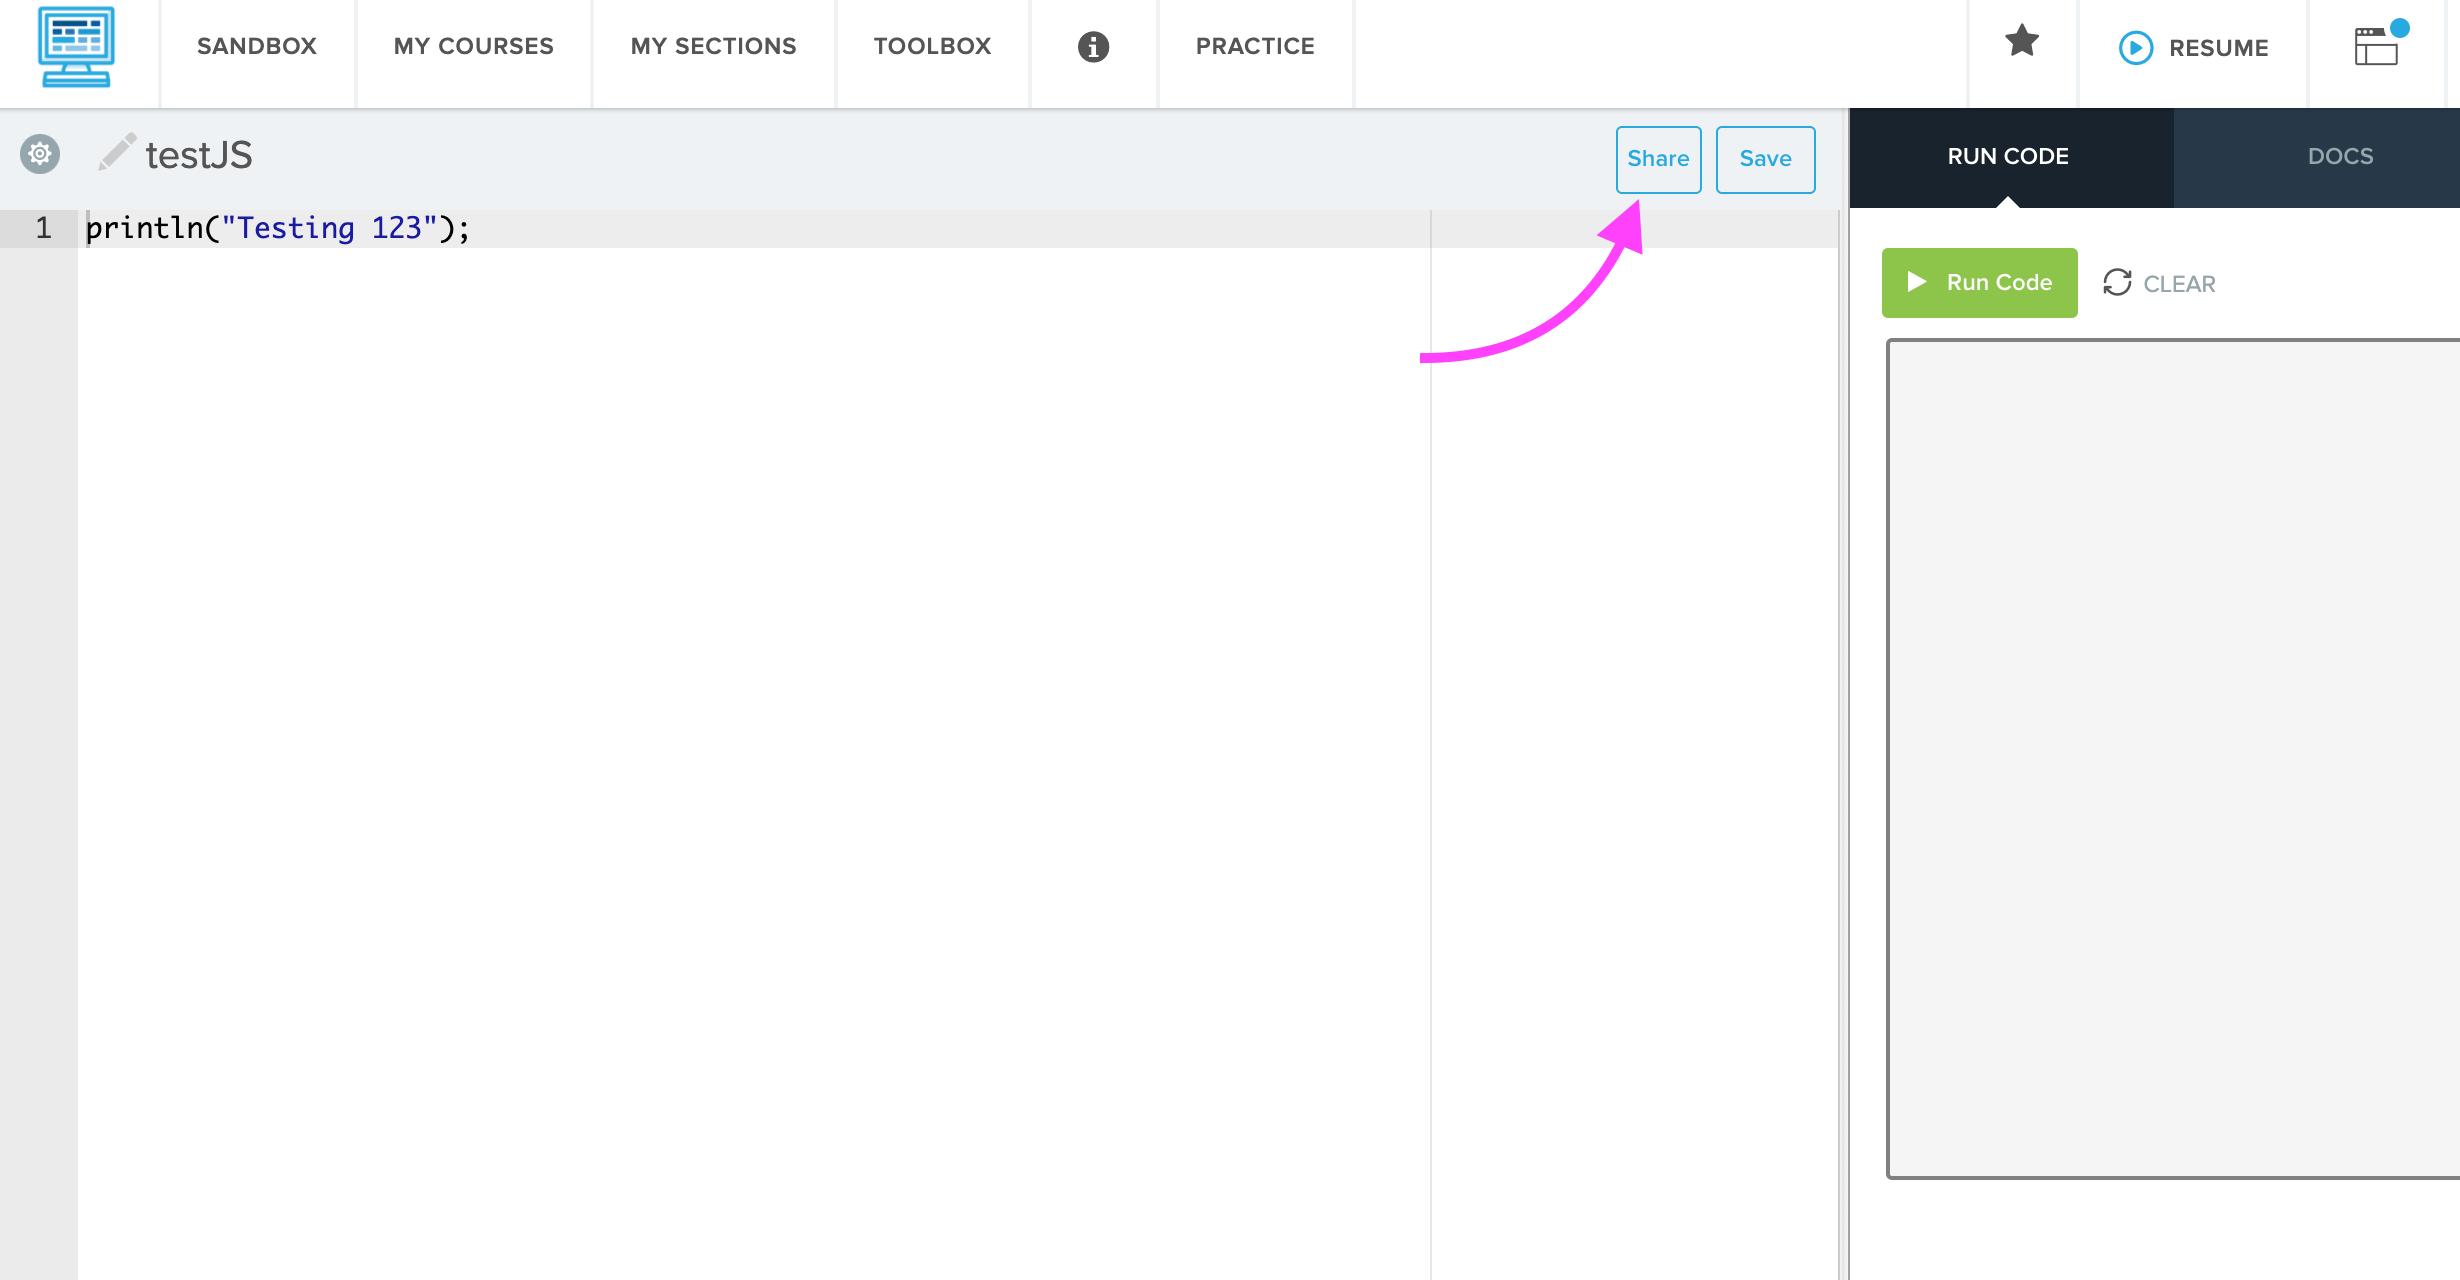 screenshot highlighting the Share button